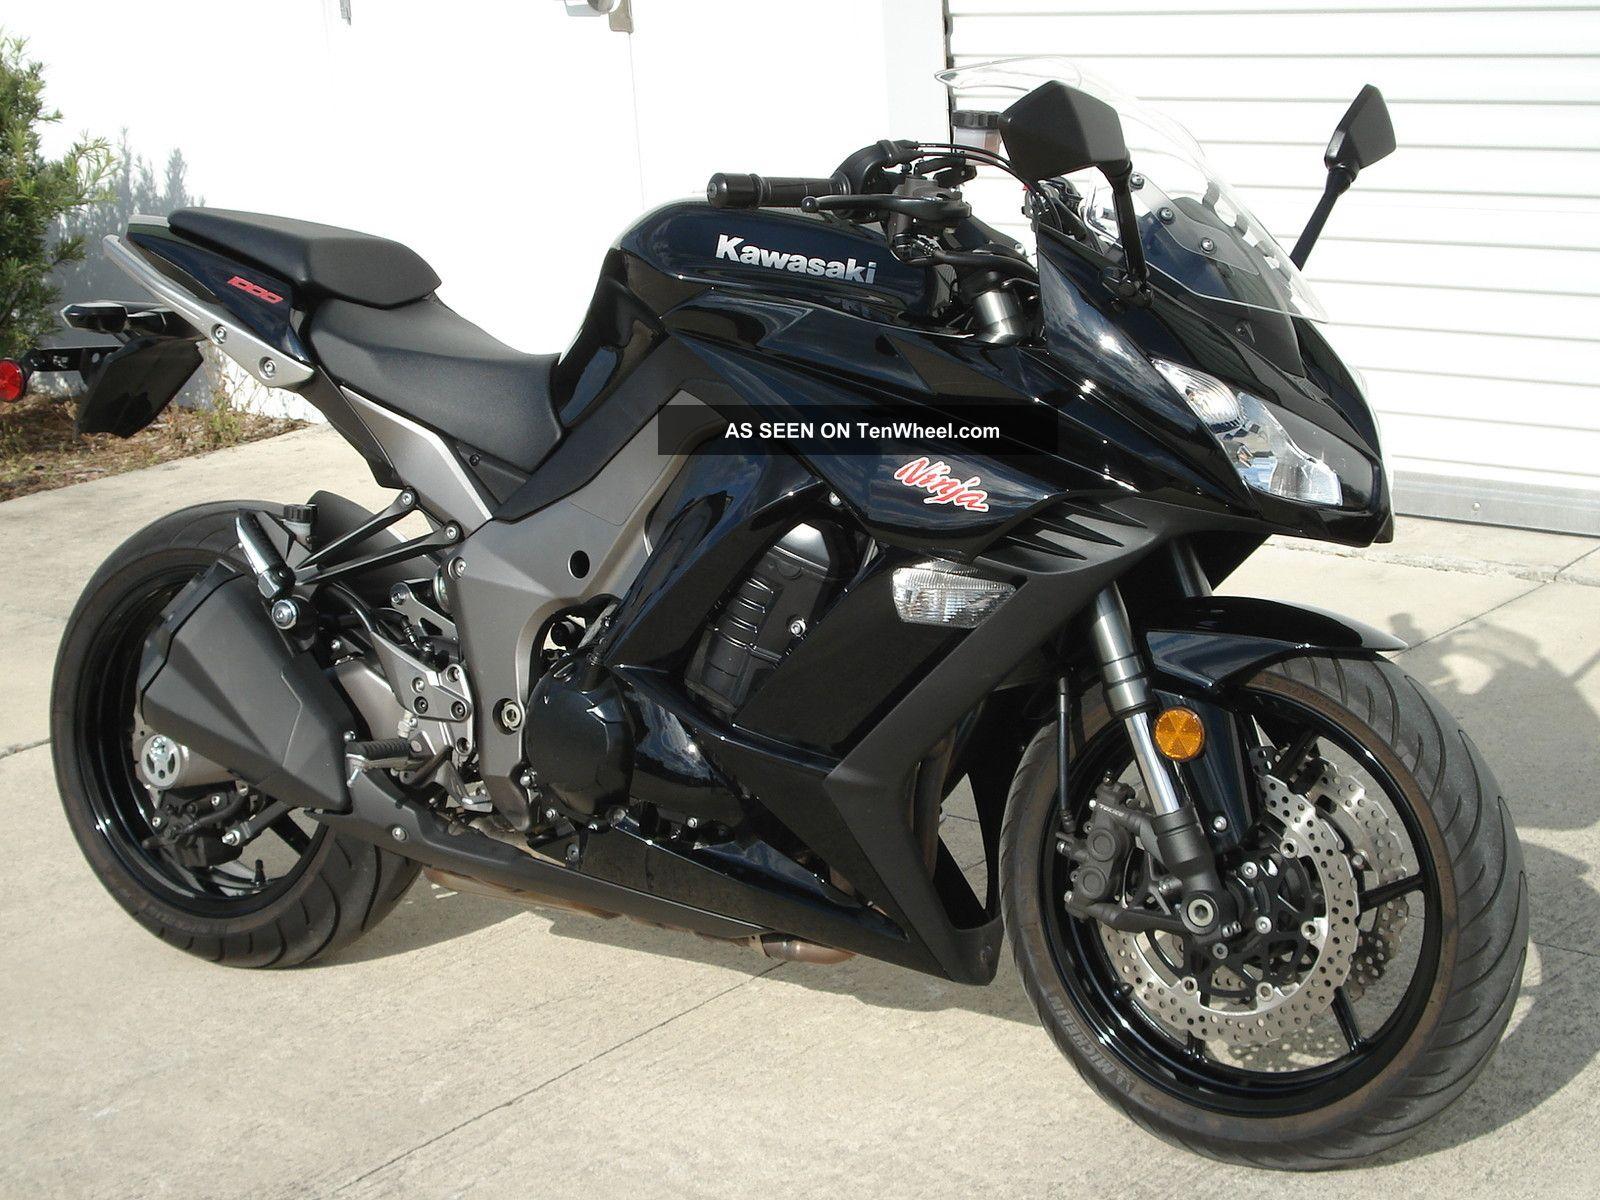 2011 Kawasaki Ninja 1000 Immaculate Bike Flawless Condition